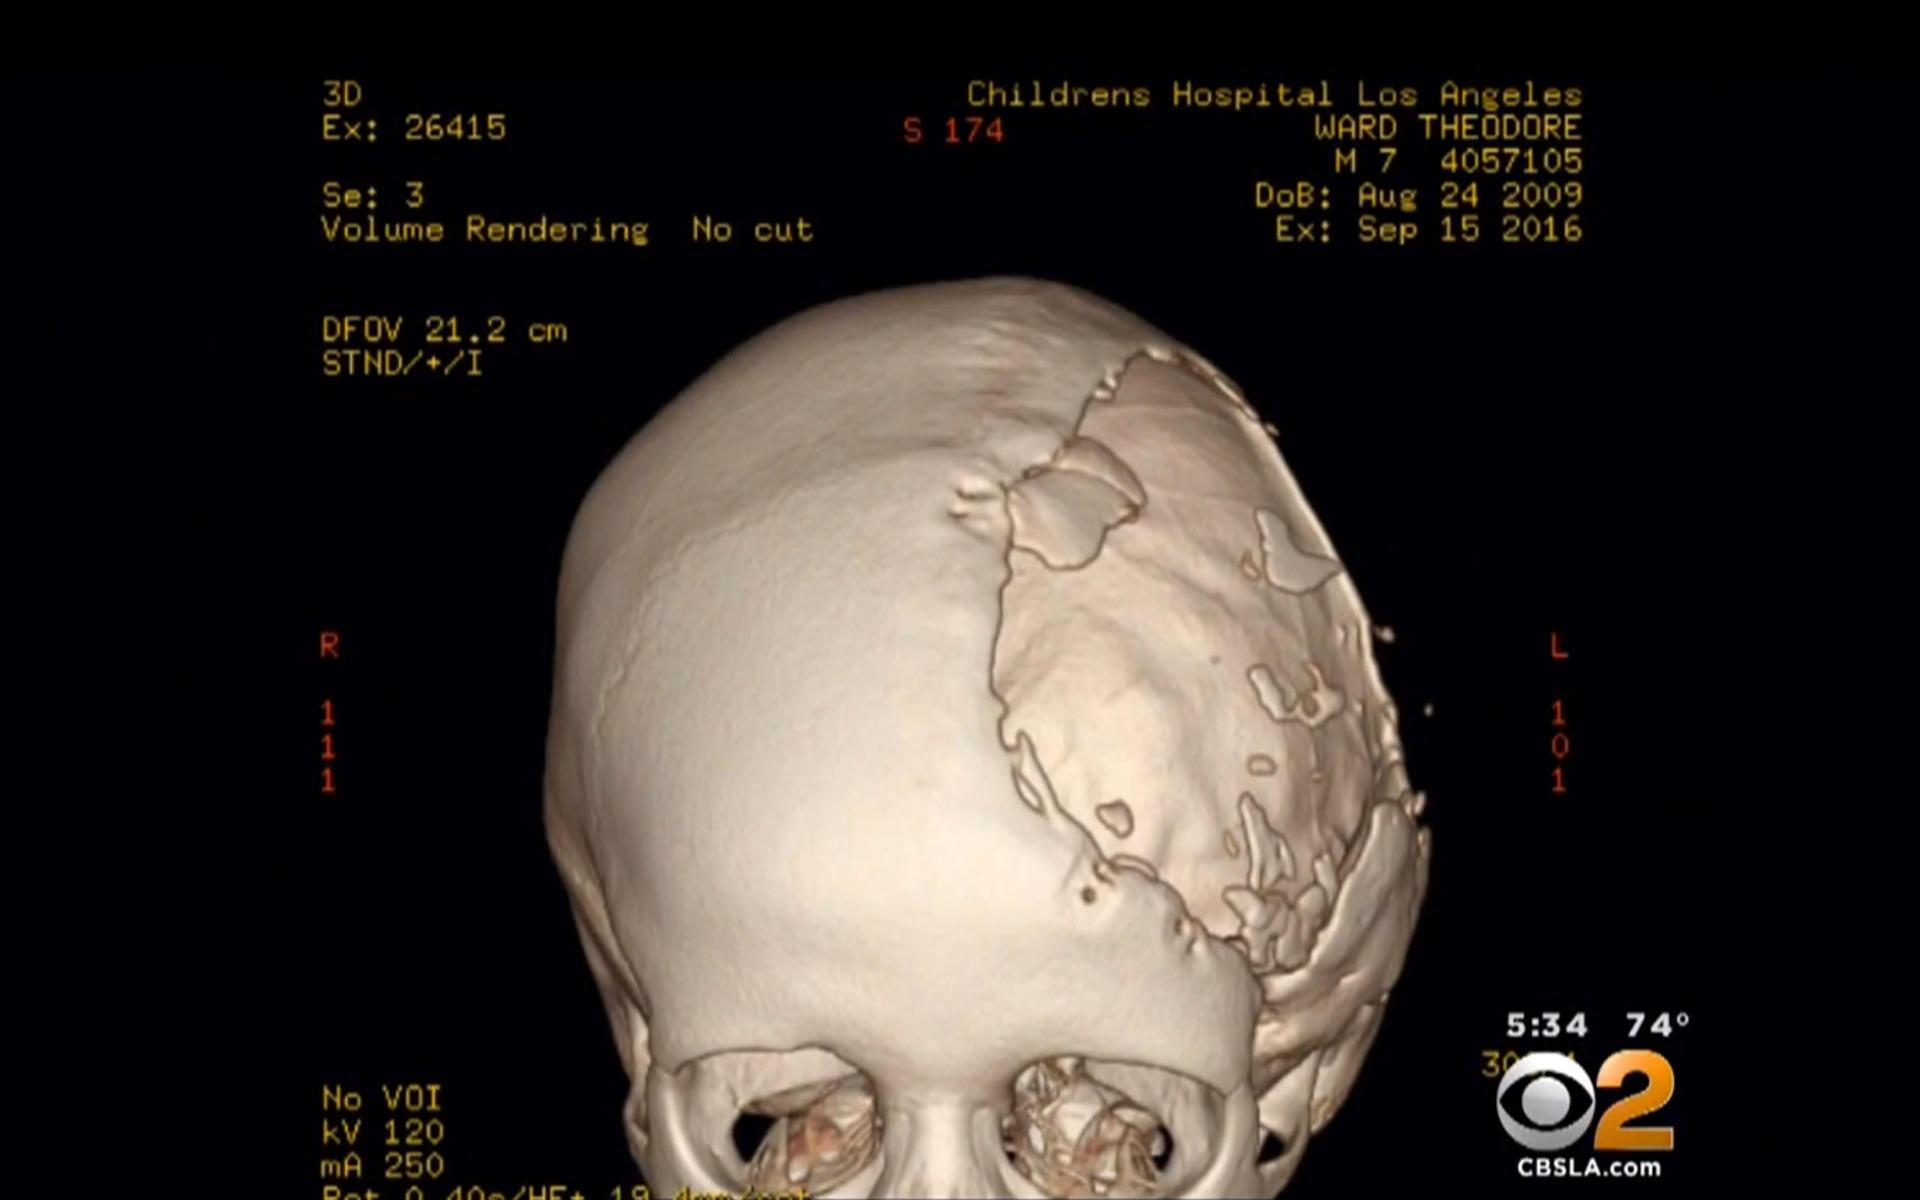 3-D printer implant, surgery give rambunctious boy back his skull